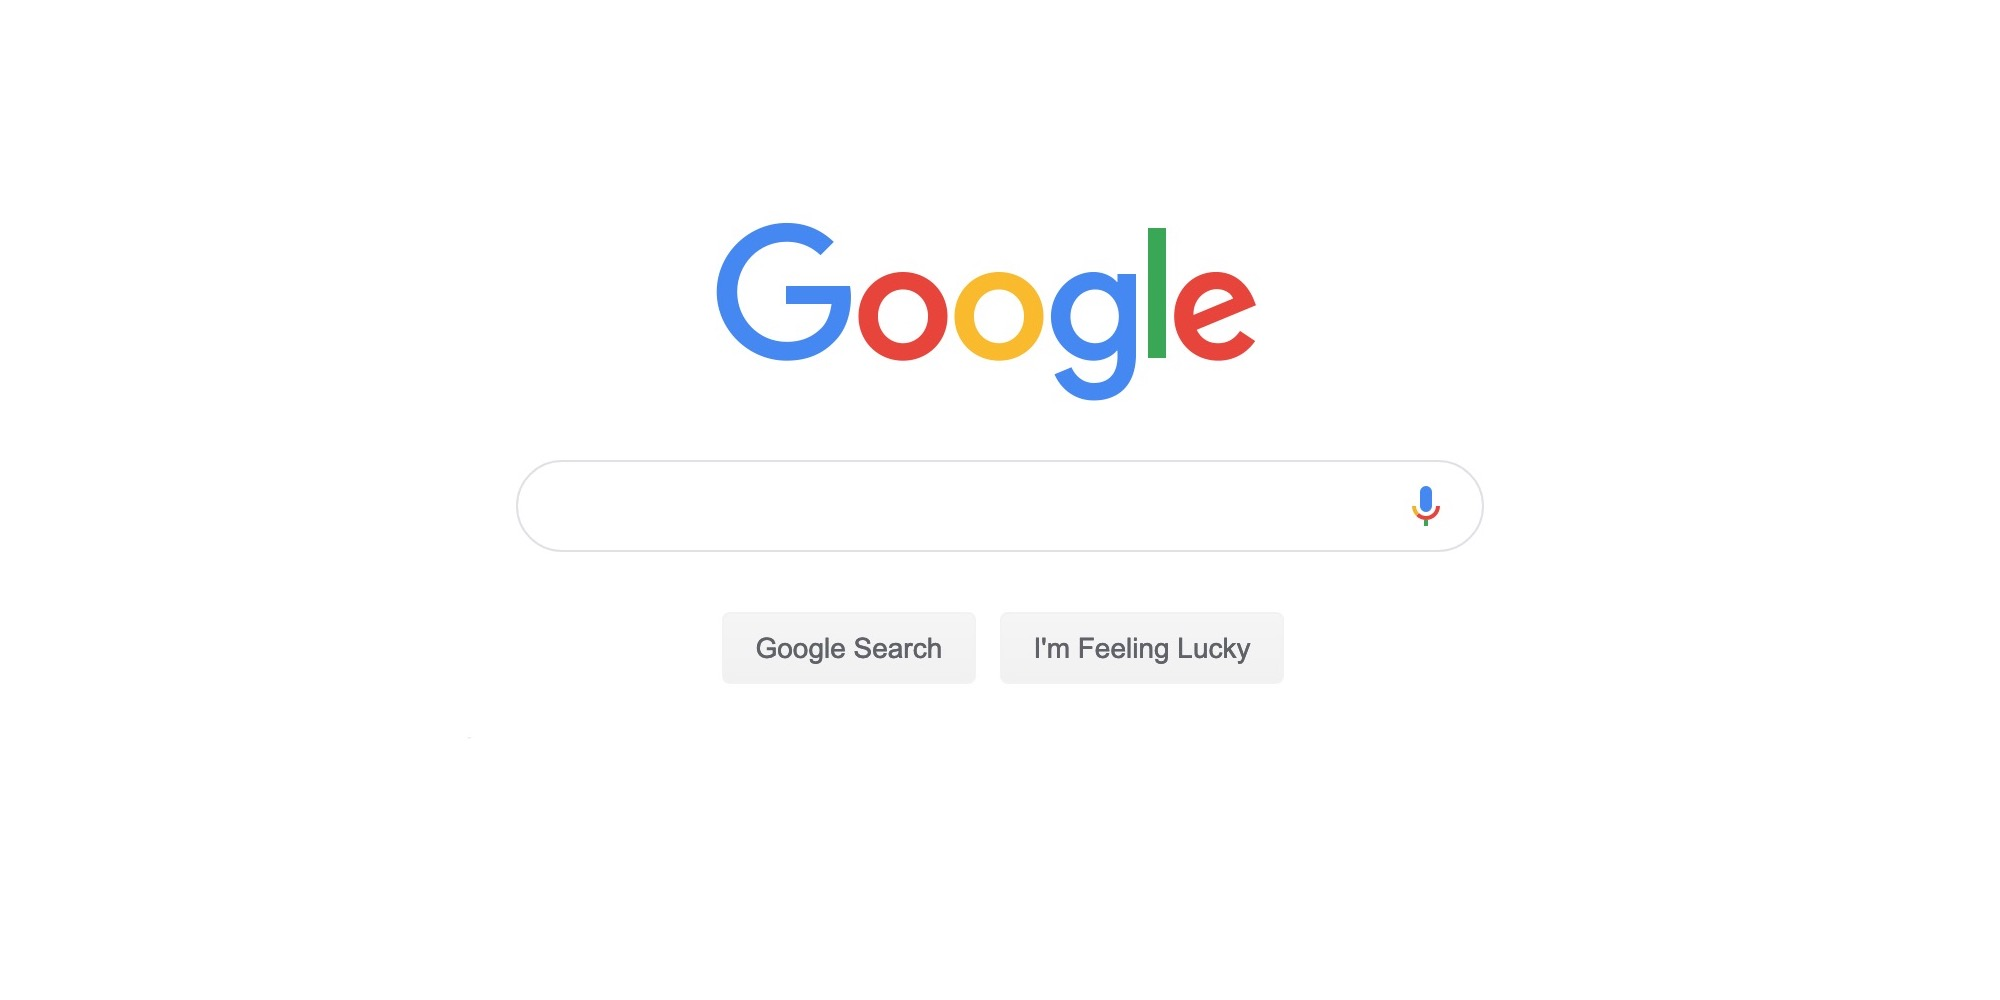 Google.Comdd